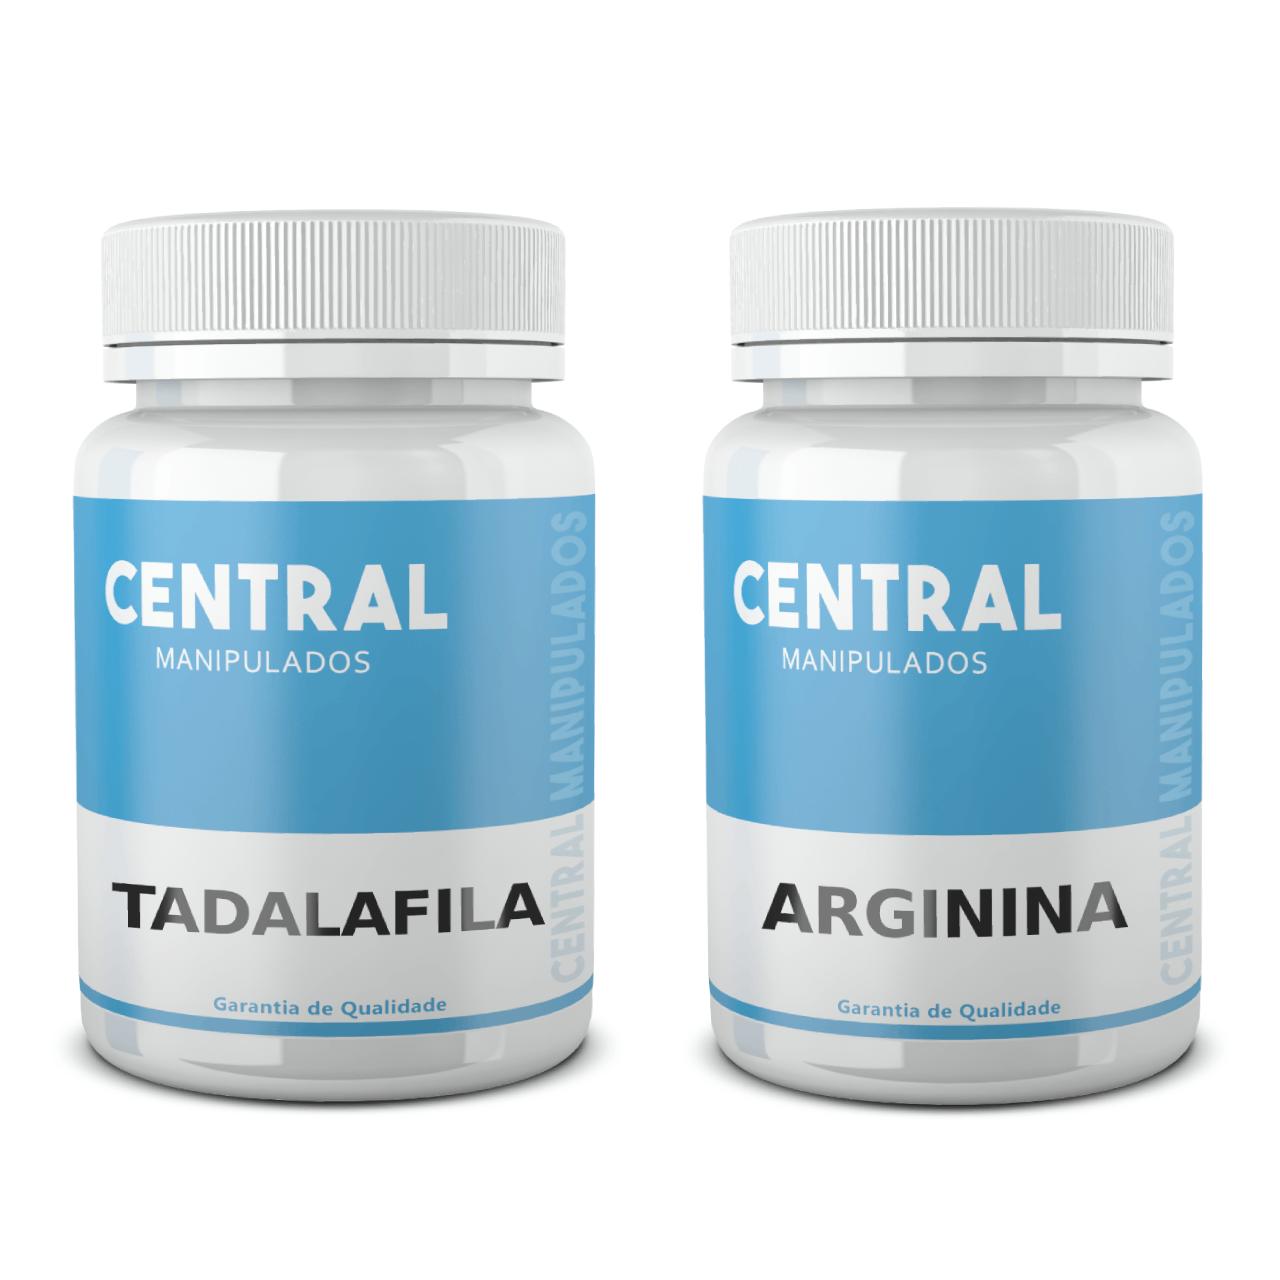 Tadalafila 15mg 60 Cápsulas  + Arginina 500mg 60 Cápsulas - Vasodilatador